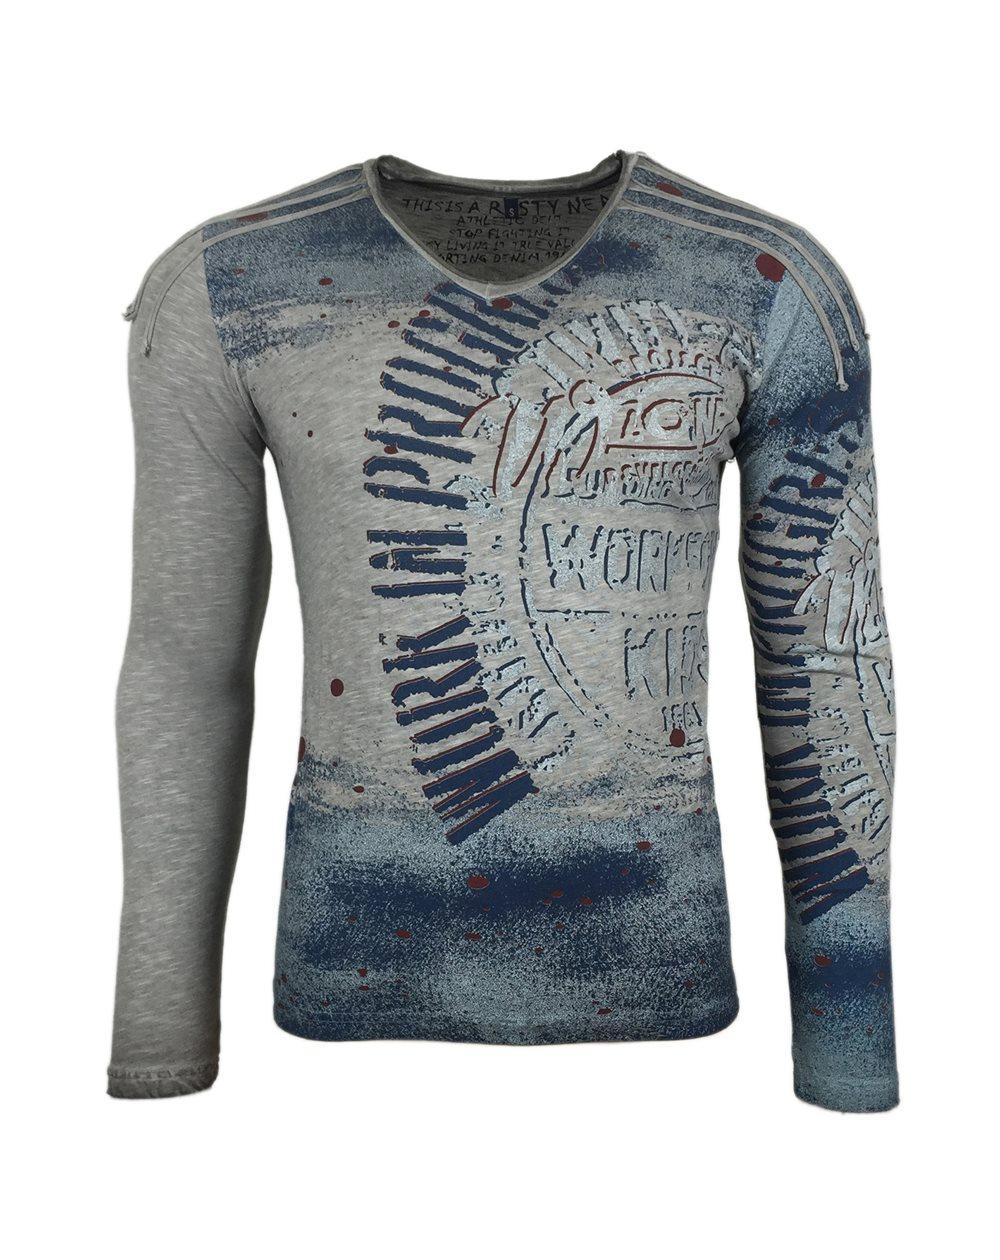 Subliminal Mode - Tee shirt delaver homme manches longues col V SB10109